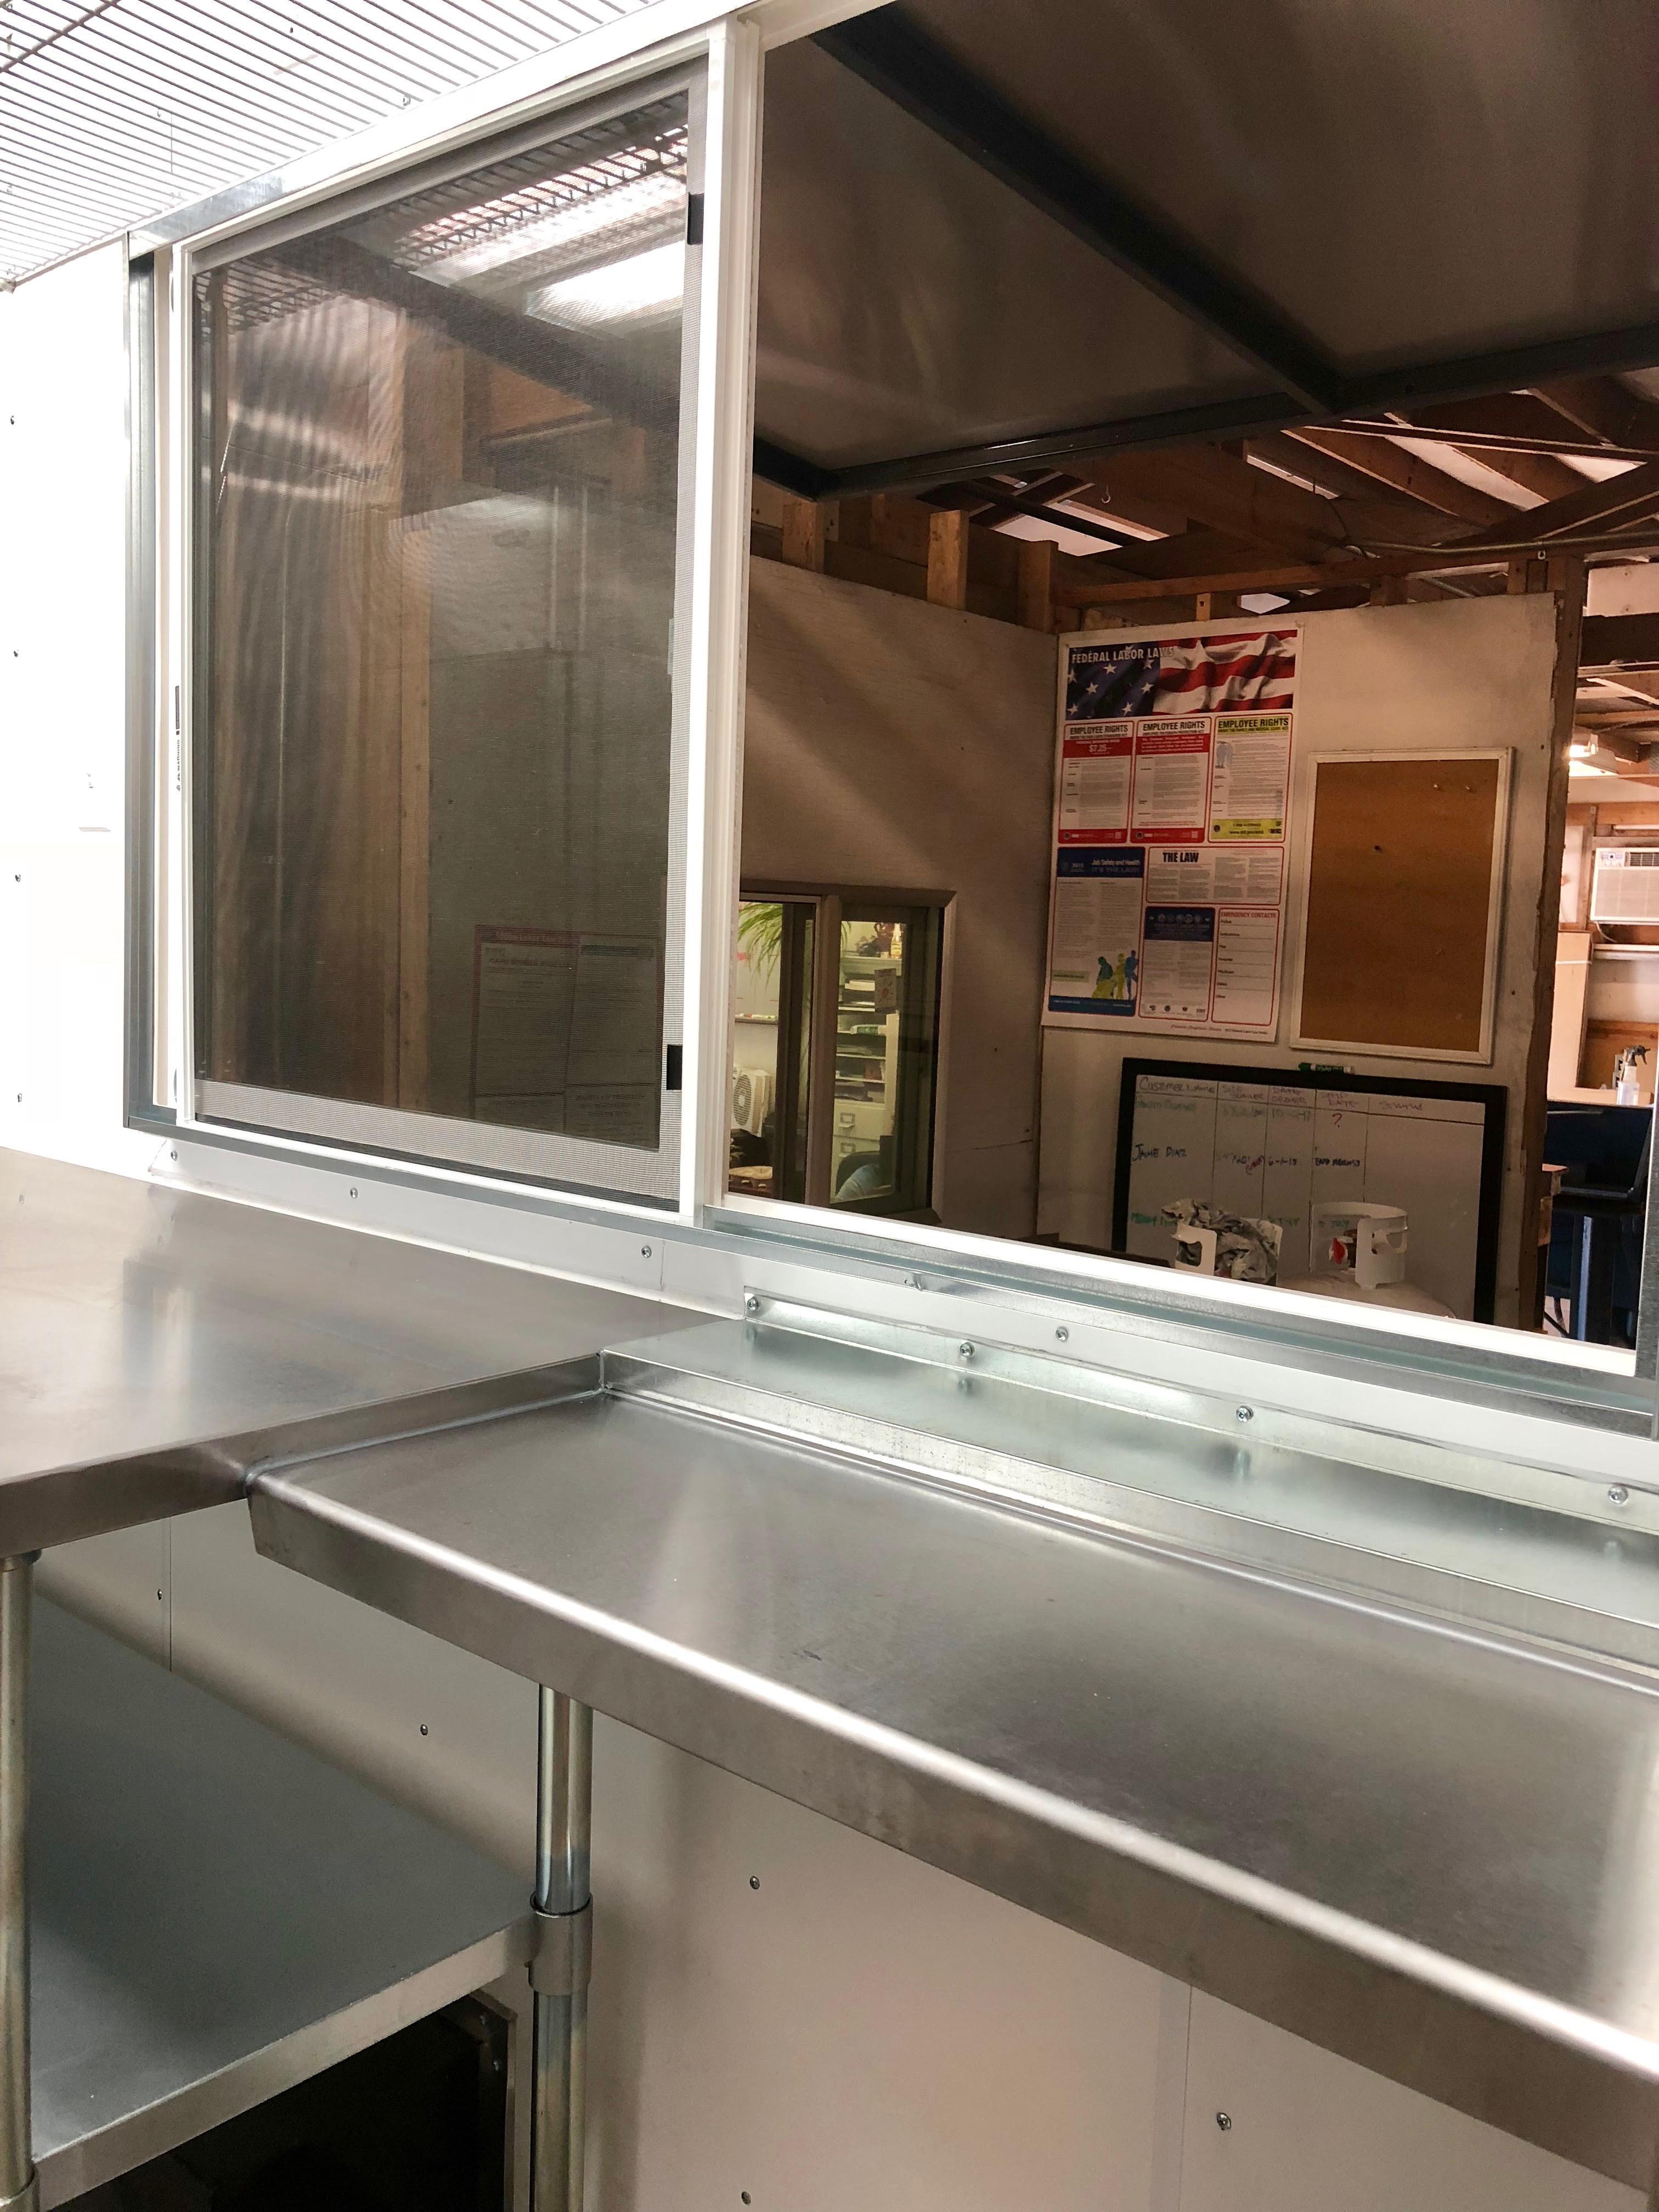 Foodtruck convenience window 13